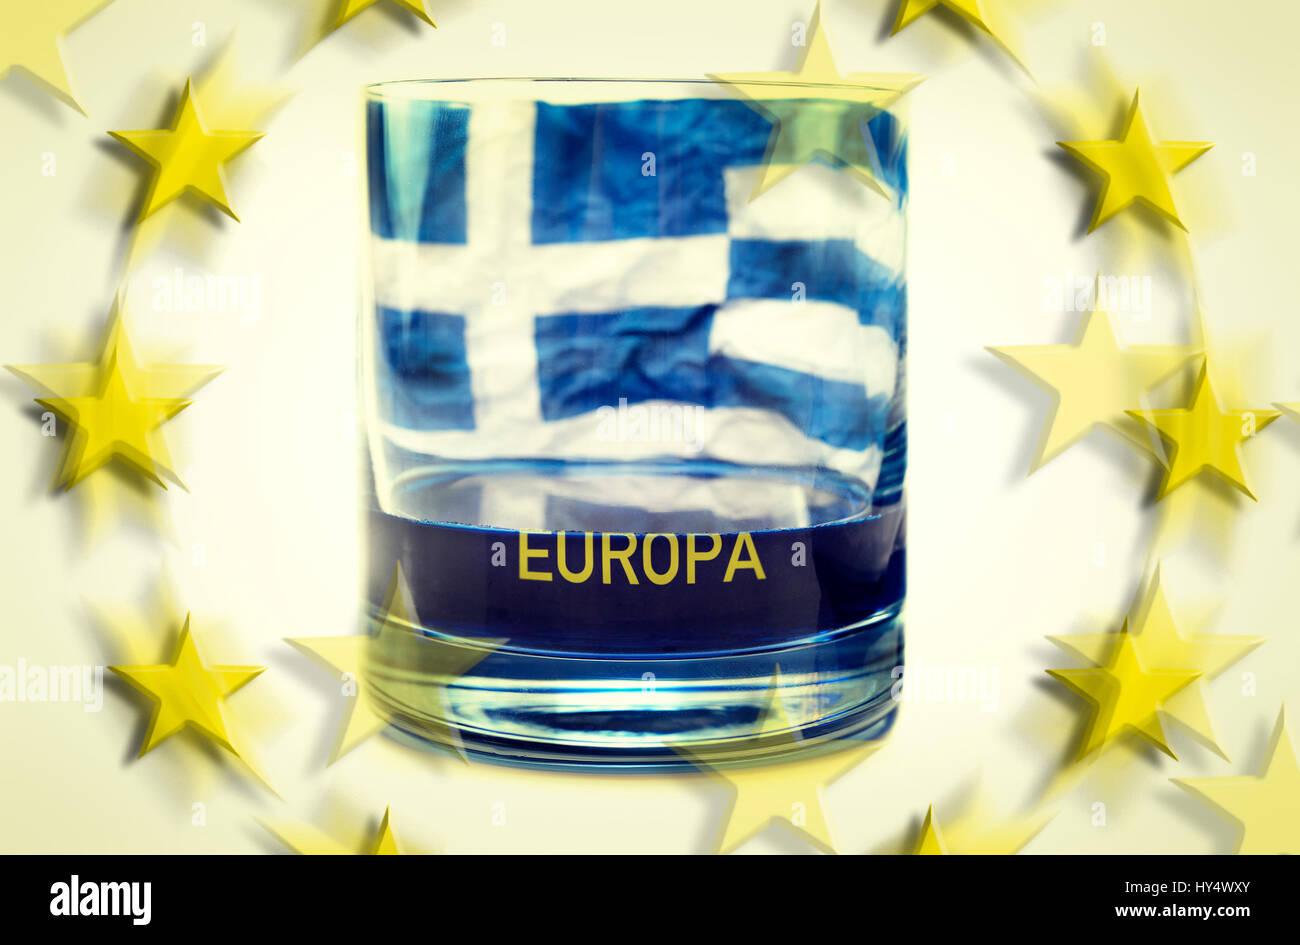 Half-empty glass with Greek flag, symbolic photo debt quarrel, Halbleeres Glas mit griechischer Fahne, Symbolfoto Stock Photo